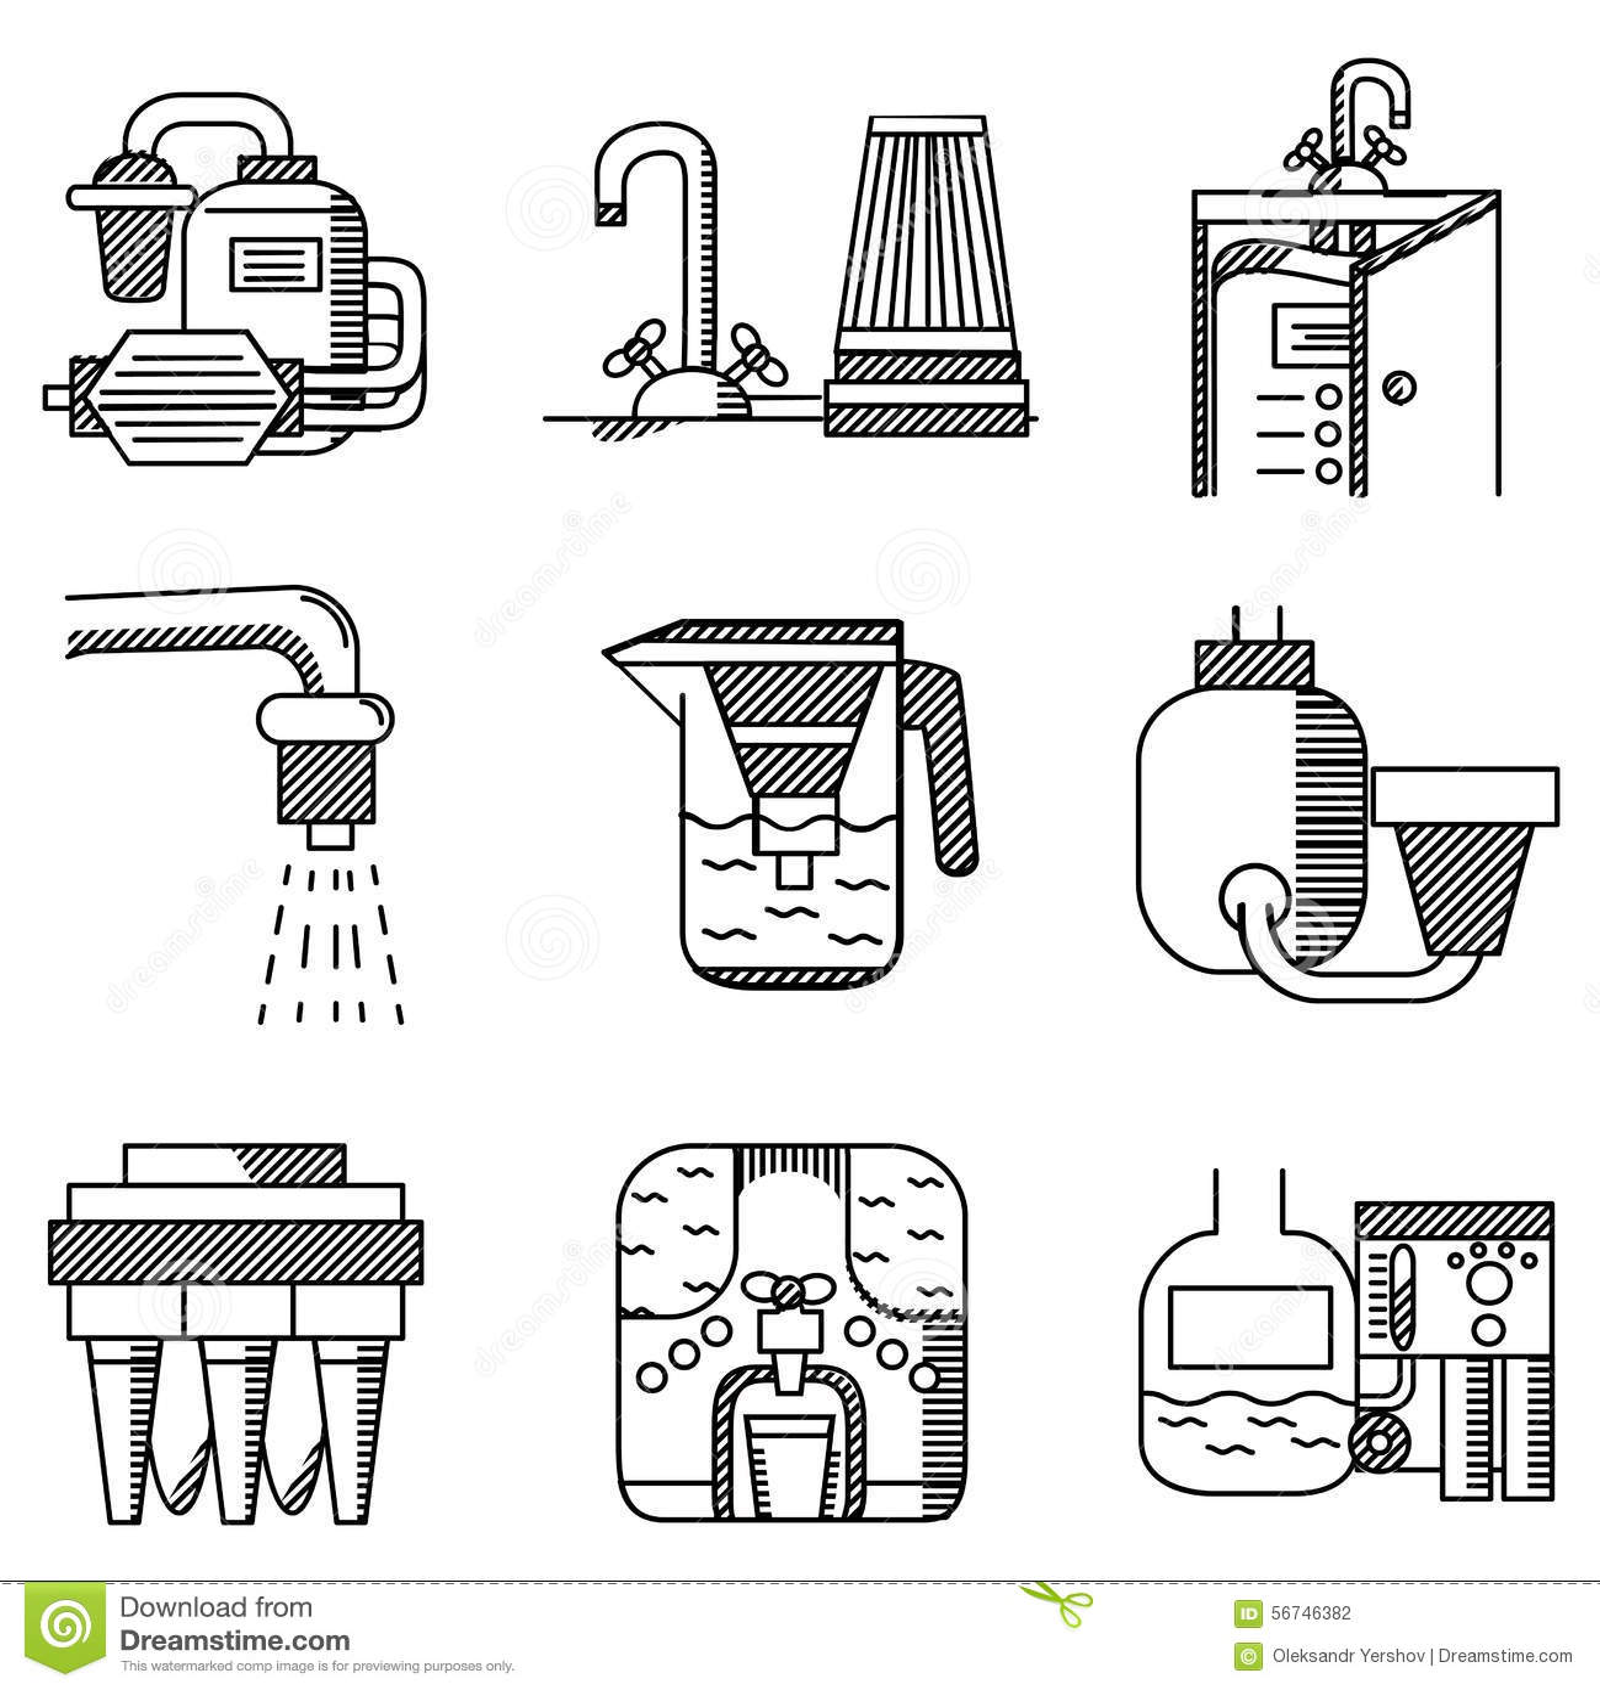 Heating Oil Filter